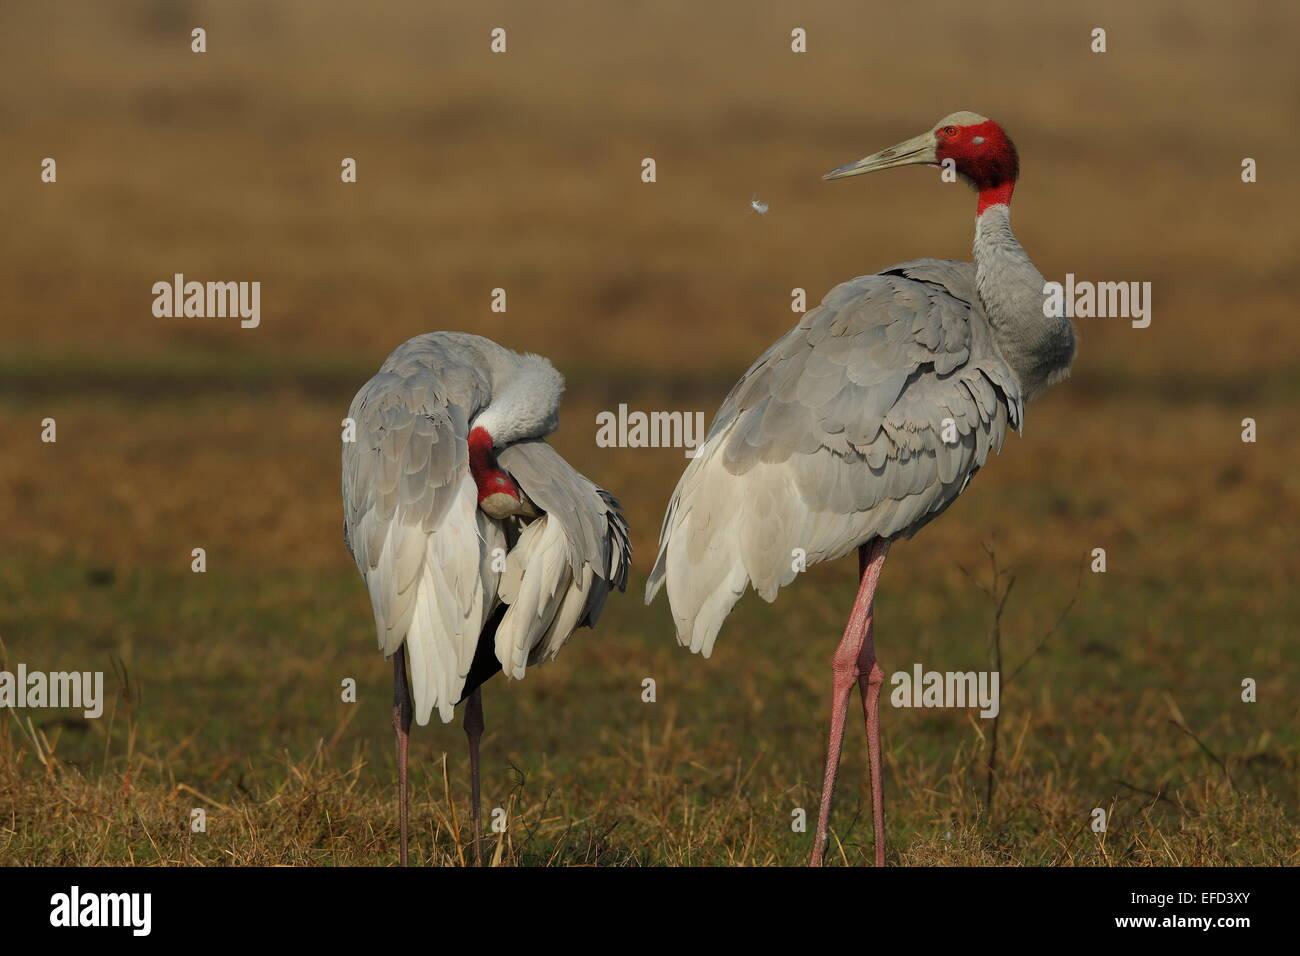 sarus crane (Grus antigone)  pair in Keoladeo Bharatpur - Stock Image